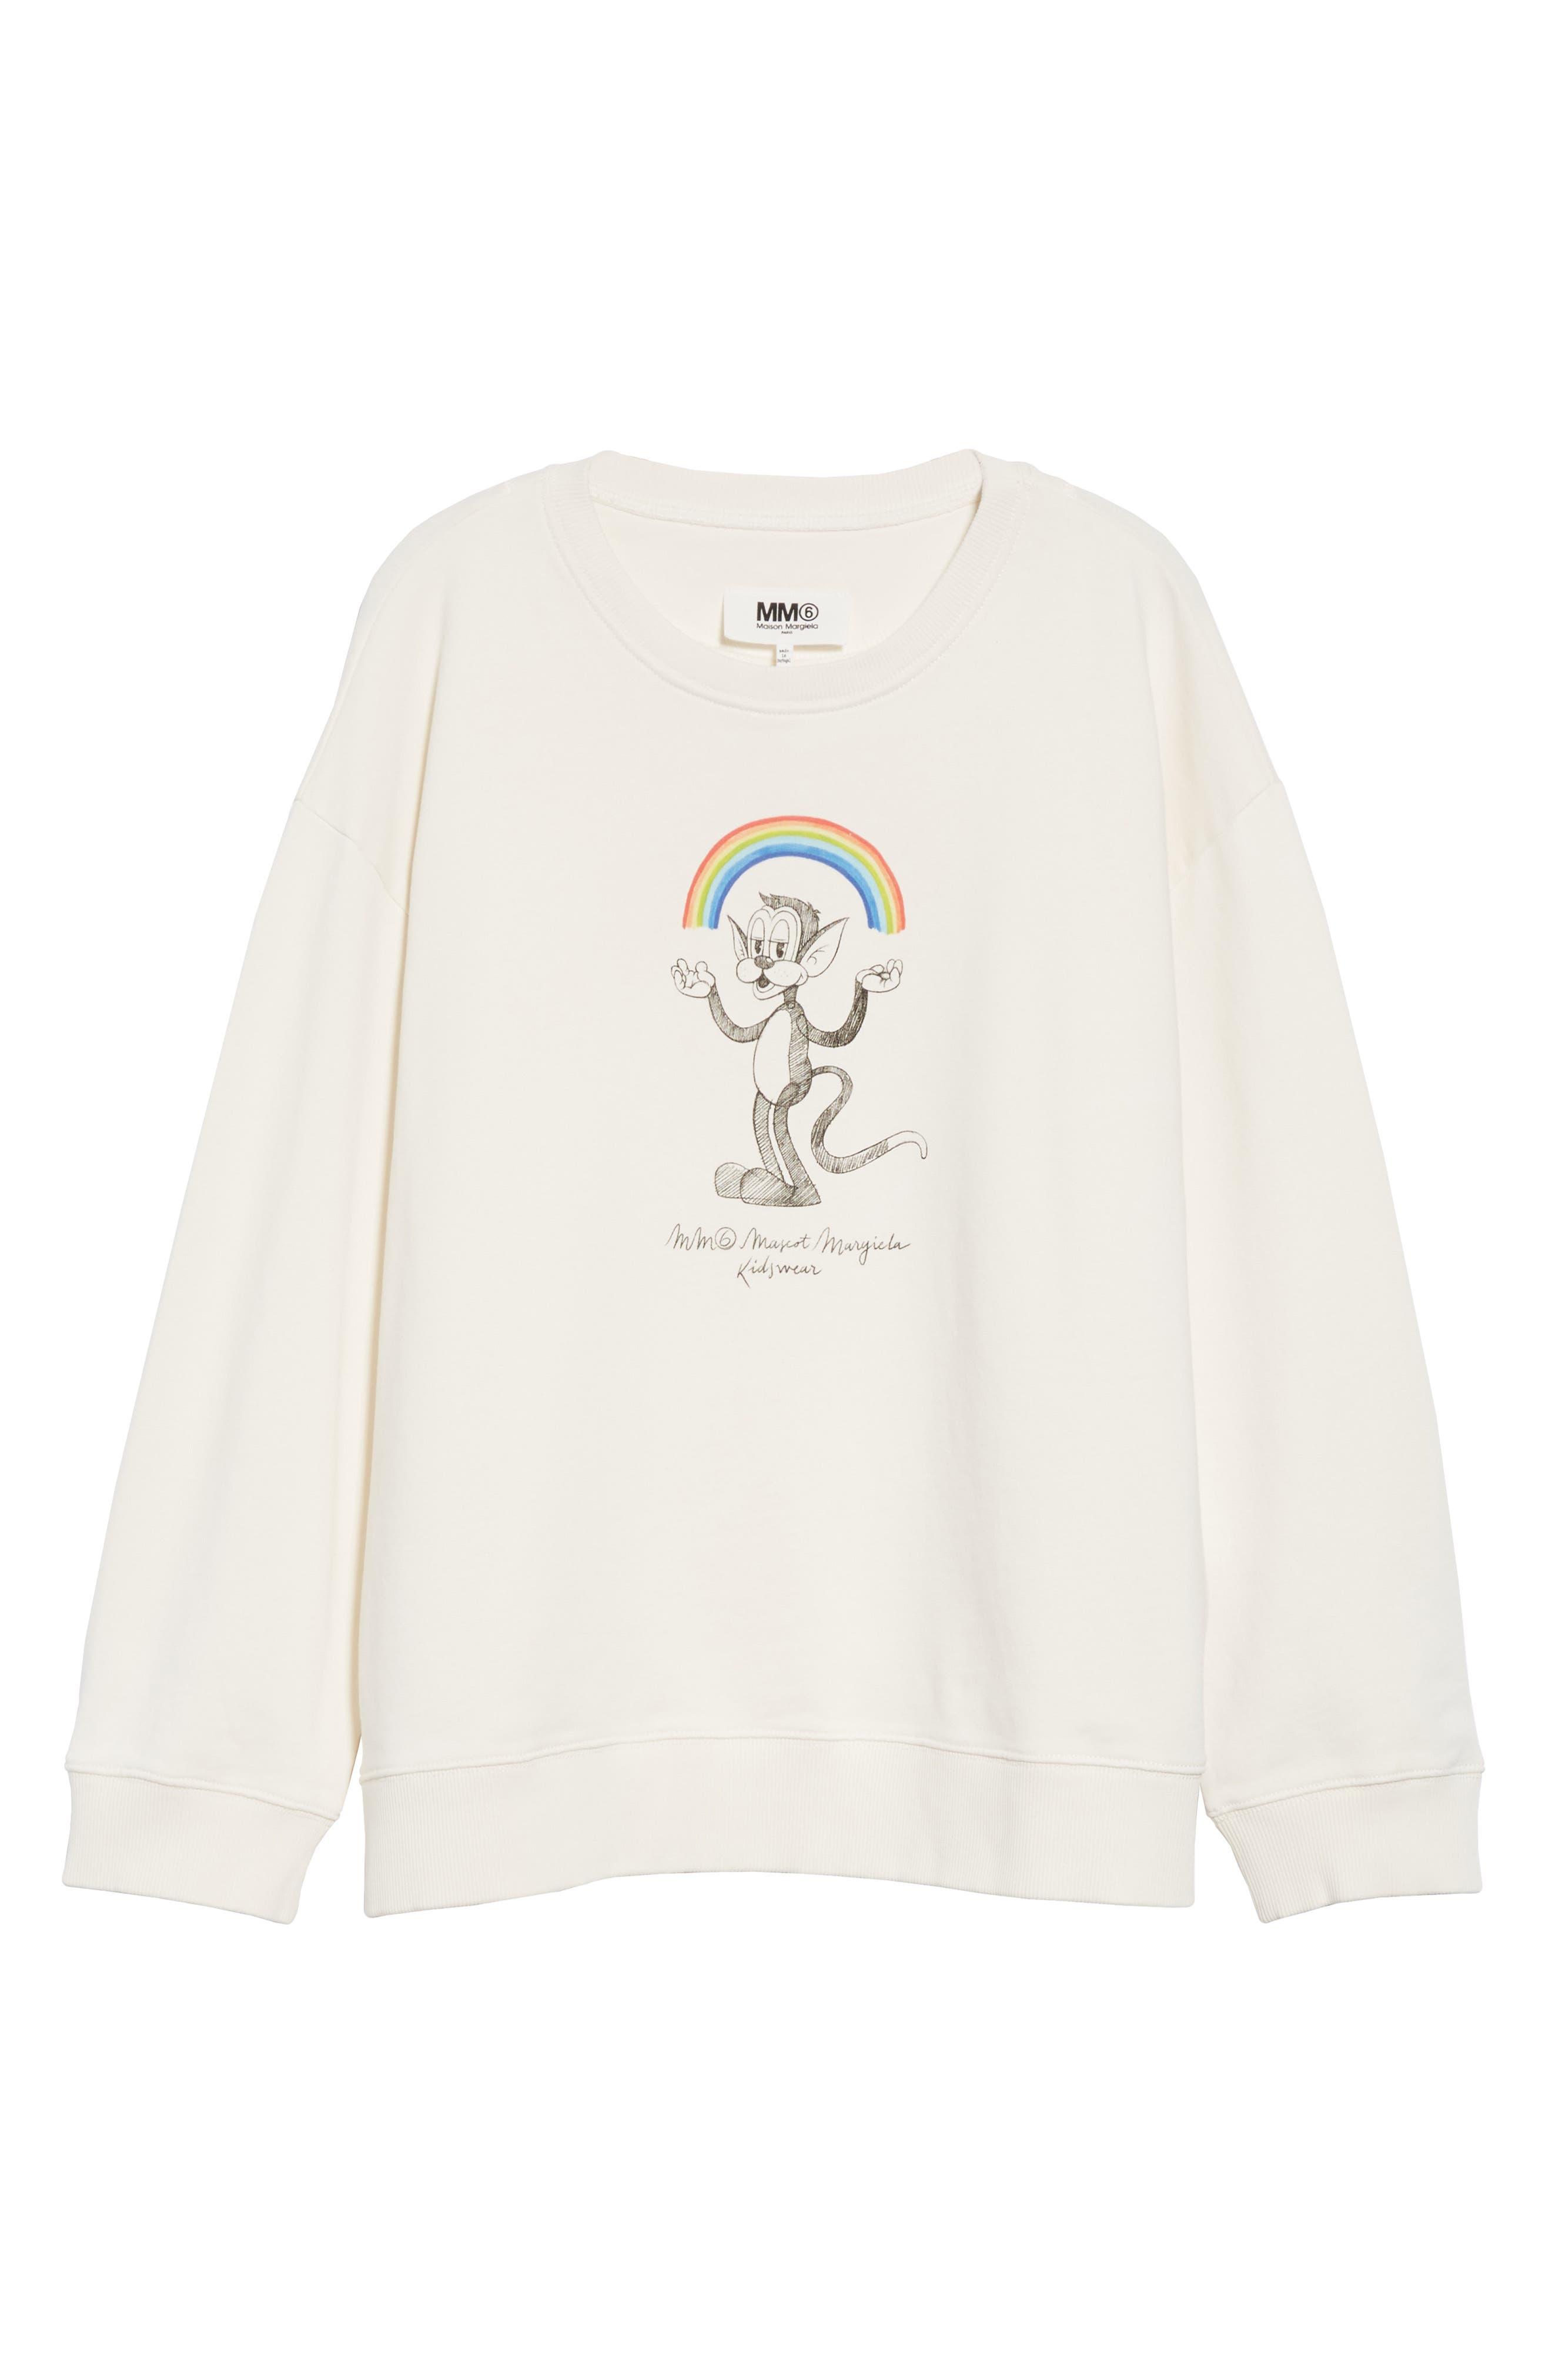 MM6 MAISON MARGIELA,                             Kidswear Mascot Graphic Sweatshirt,                             Alternate thumbnail 6, color,                             OFF WHITE